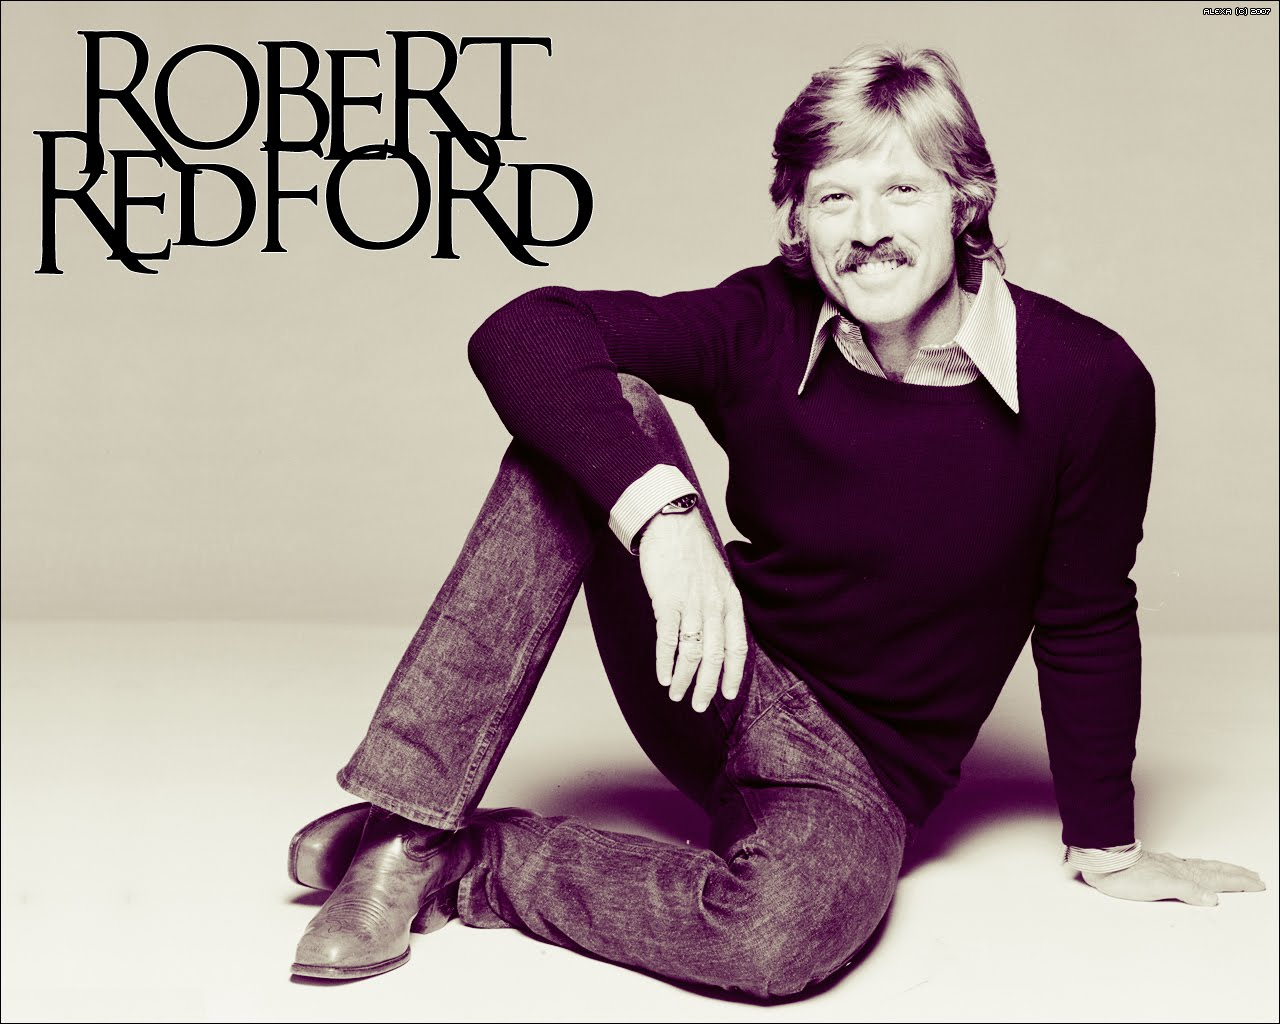 http://4.bp.blogspot.com/-XTL4ytXbsio/TzKZlx18yMI/AAAAAAAABe0/_x9gX7iIyHc/s1600/robert-redford-wallpaper-8-782961.jpg